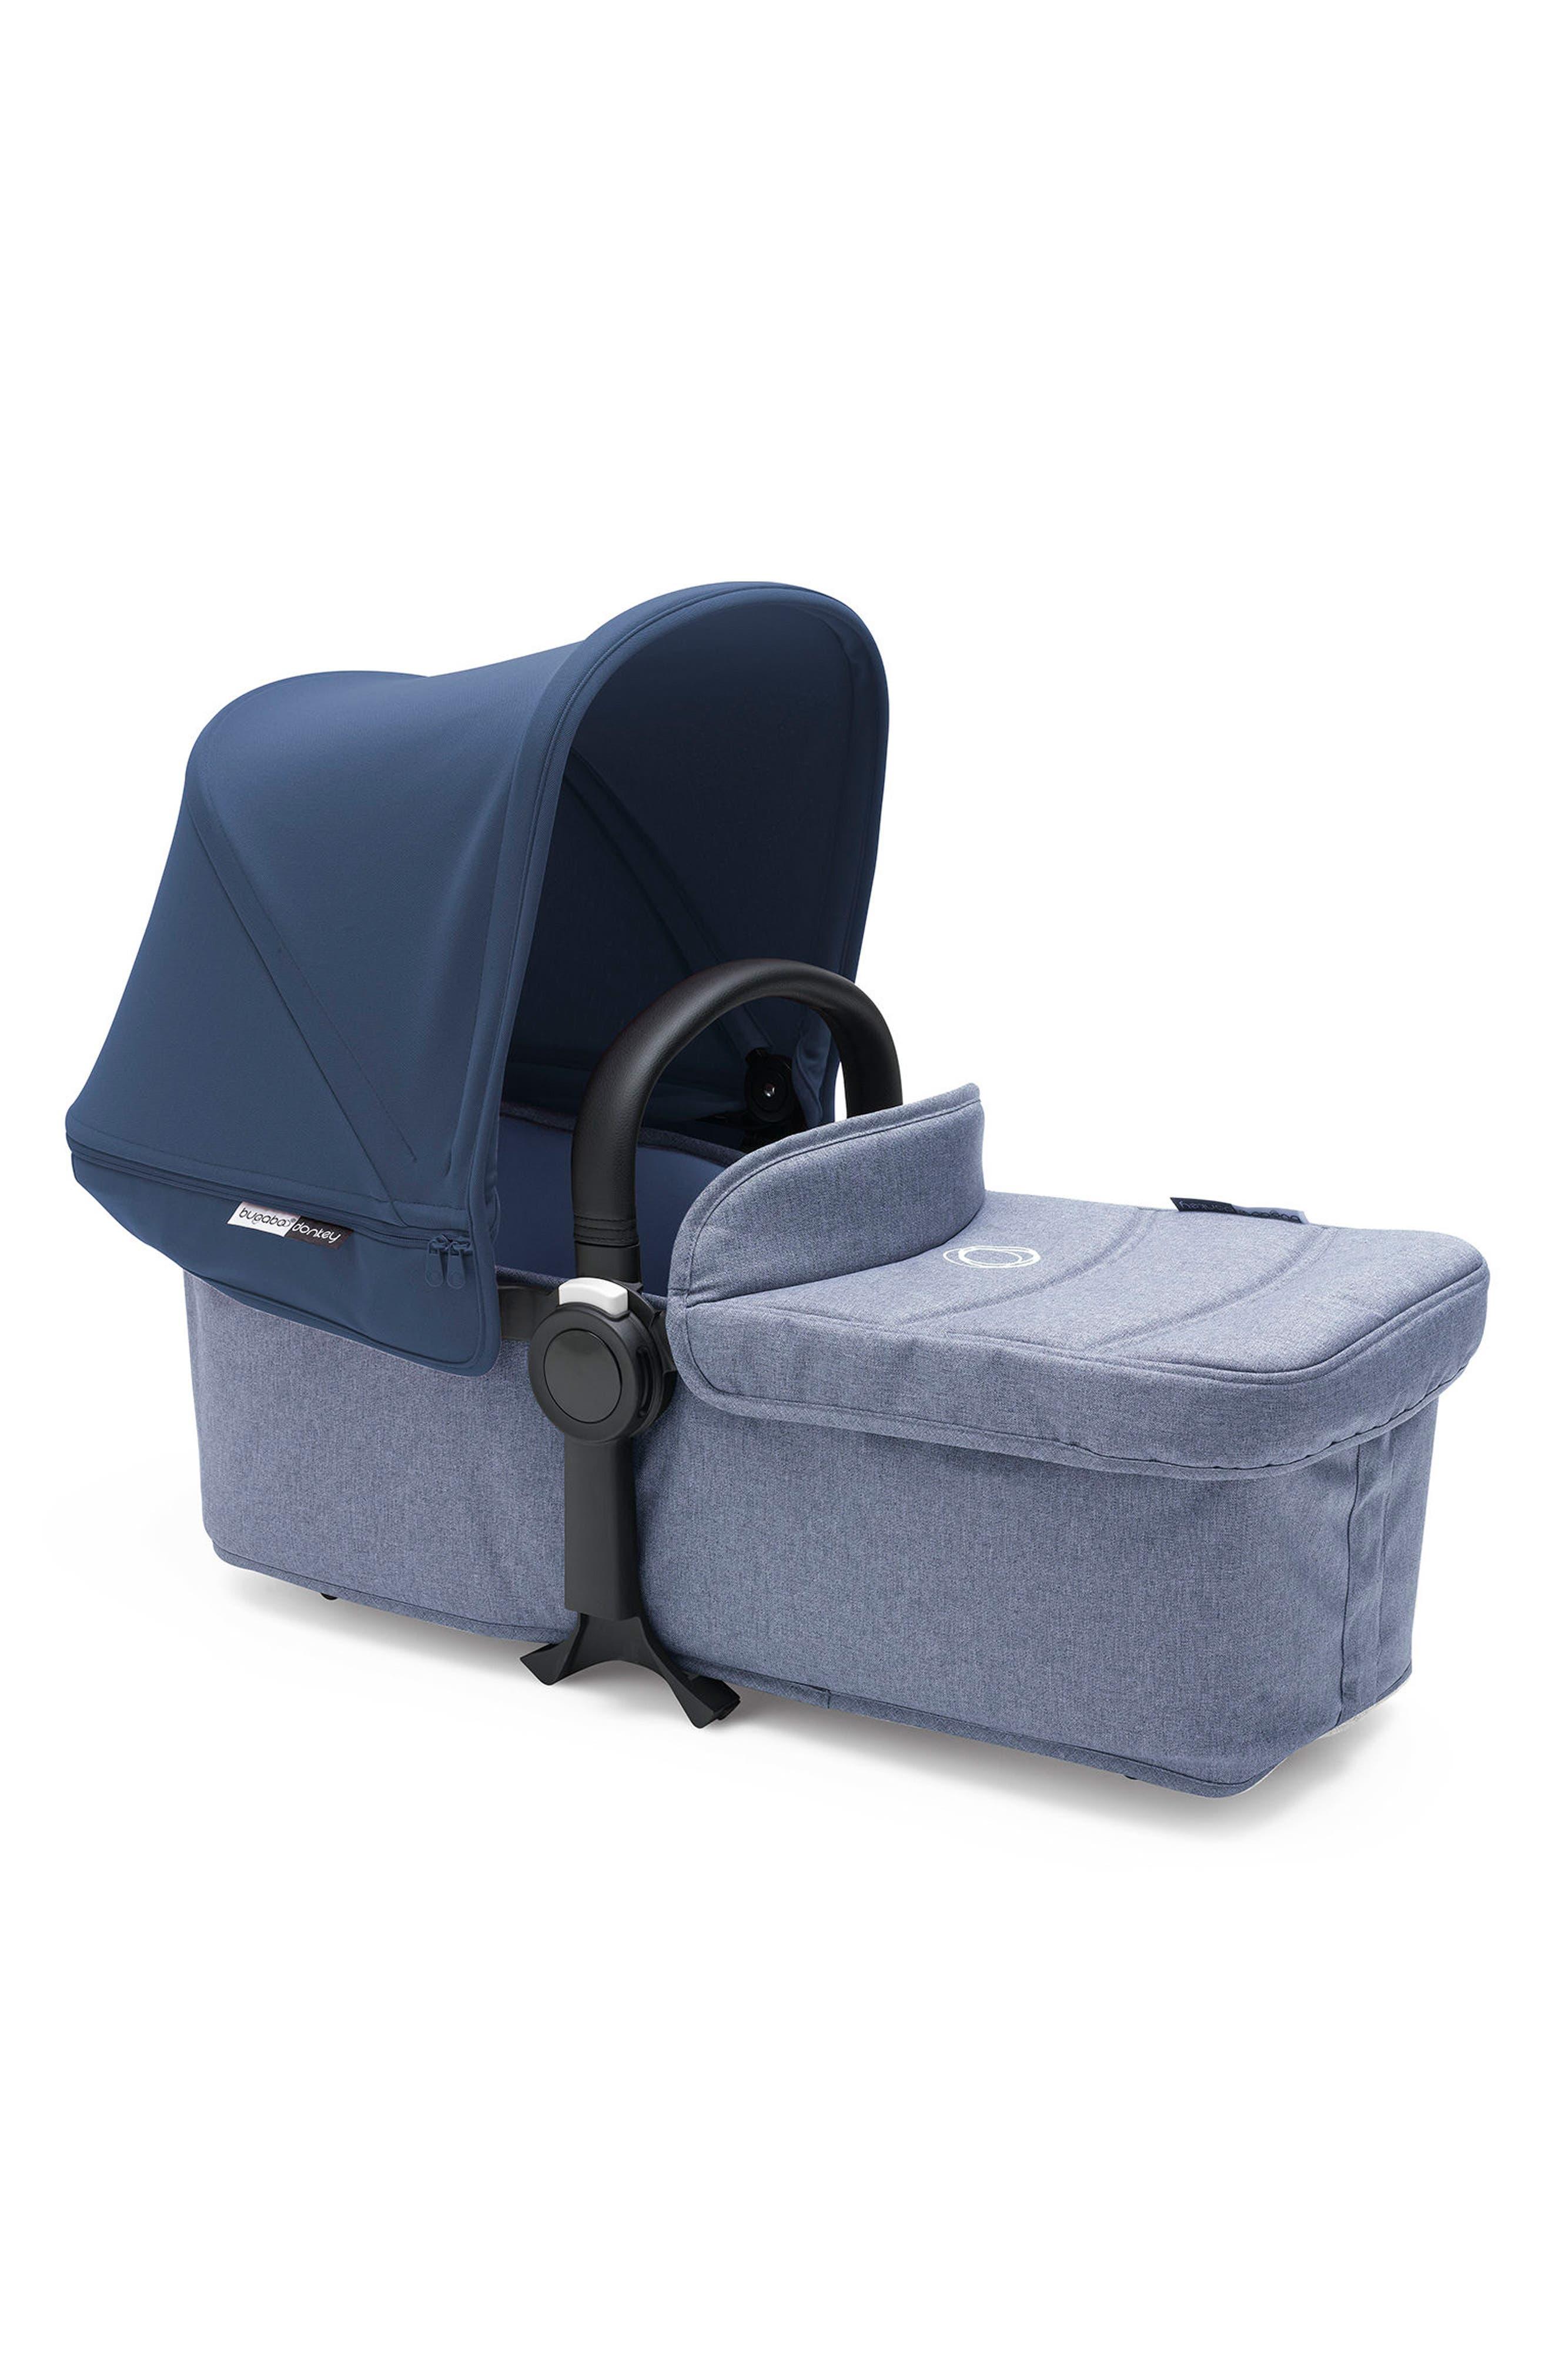 Bassinet Tailored Fabric Set for Donkey2 Stroller,                             Main thumbnail 1, color,                             Blue Melange